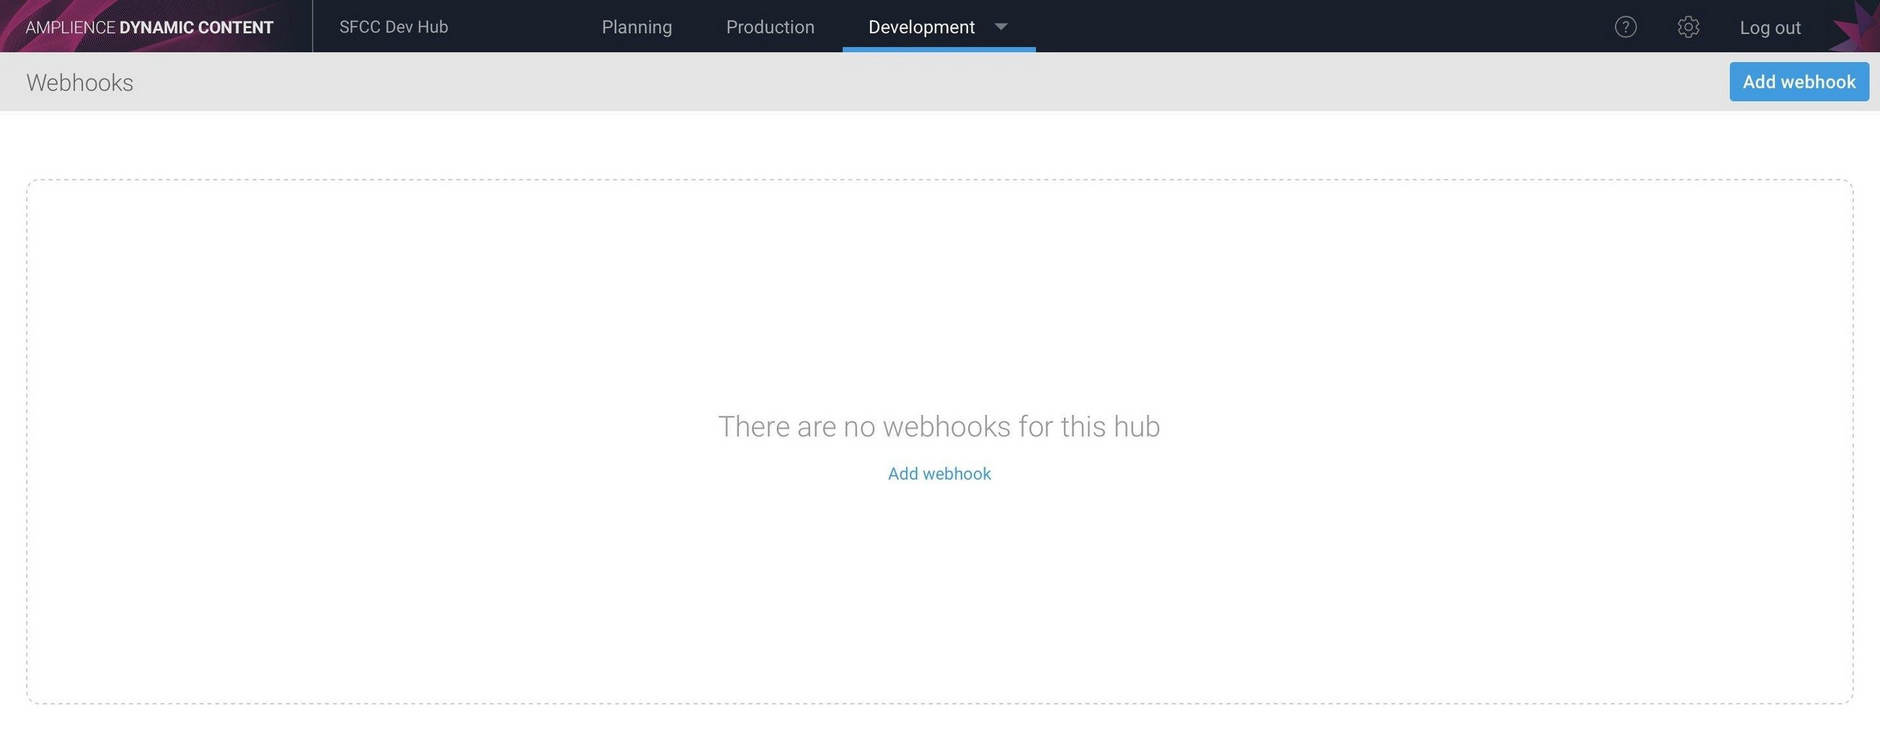 Click the Add webhook button to add a webhook